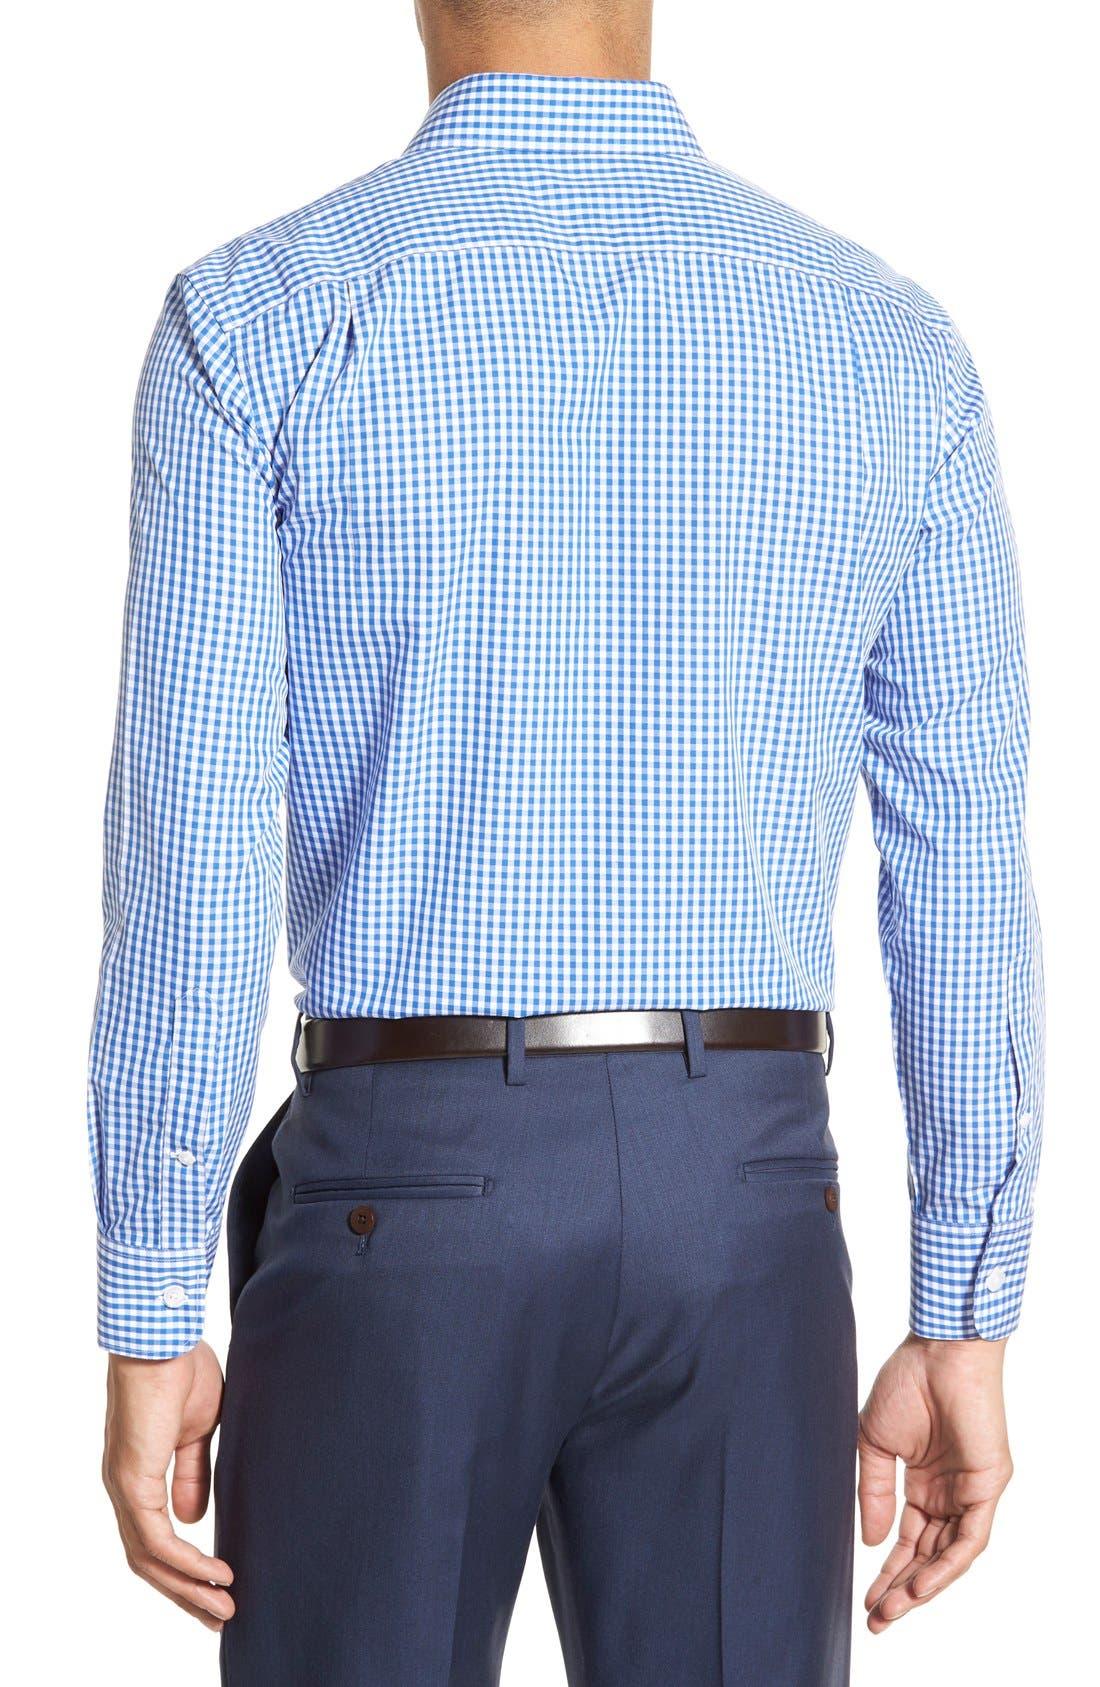 Slim Fit Wrinkle Free Check Dress Shirt,                             Alternate thumbnail 4, color,                             BAY BLUE